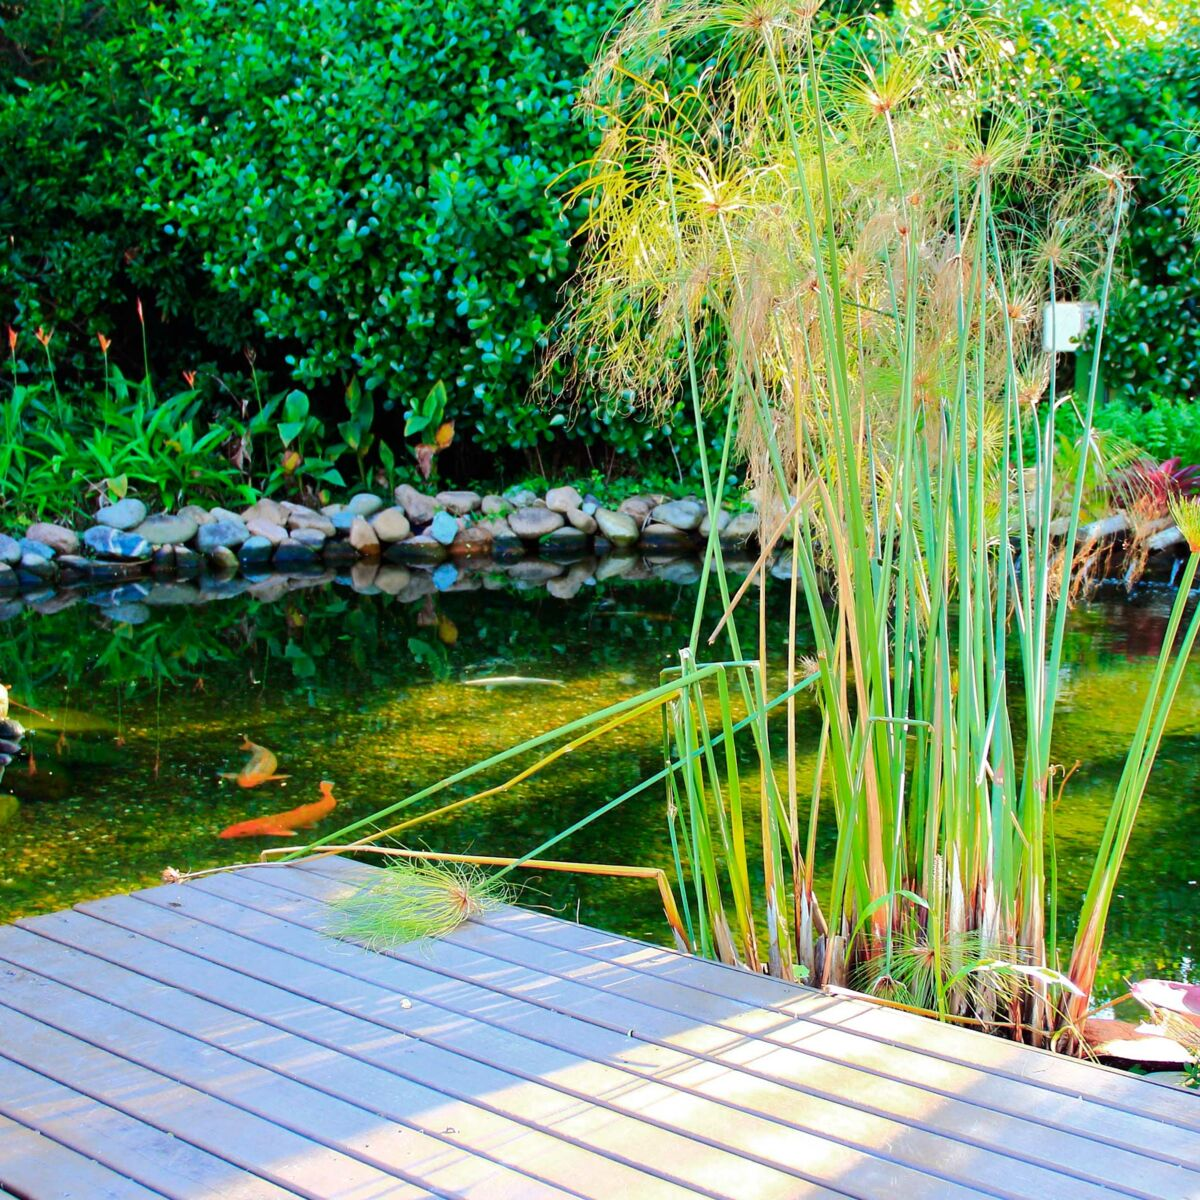 Bassin Préformé Hors Sol installer un bassin dans son jardin : mode d'emploi : femme